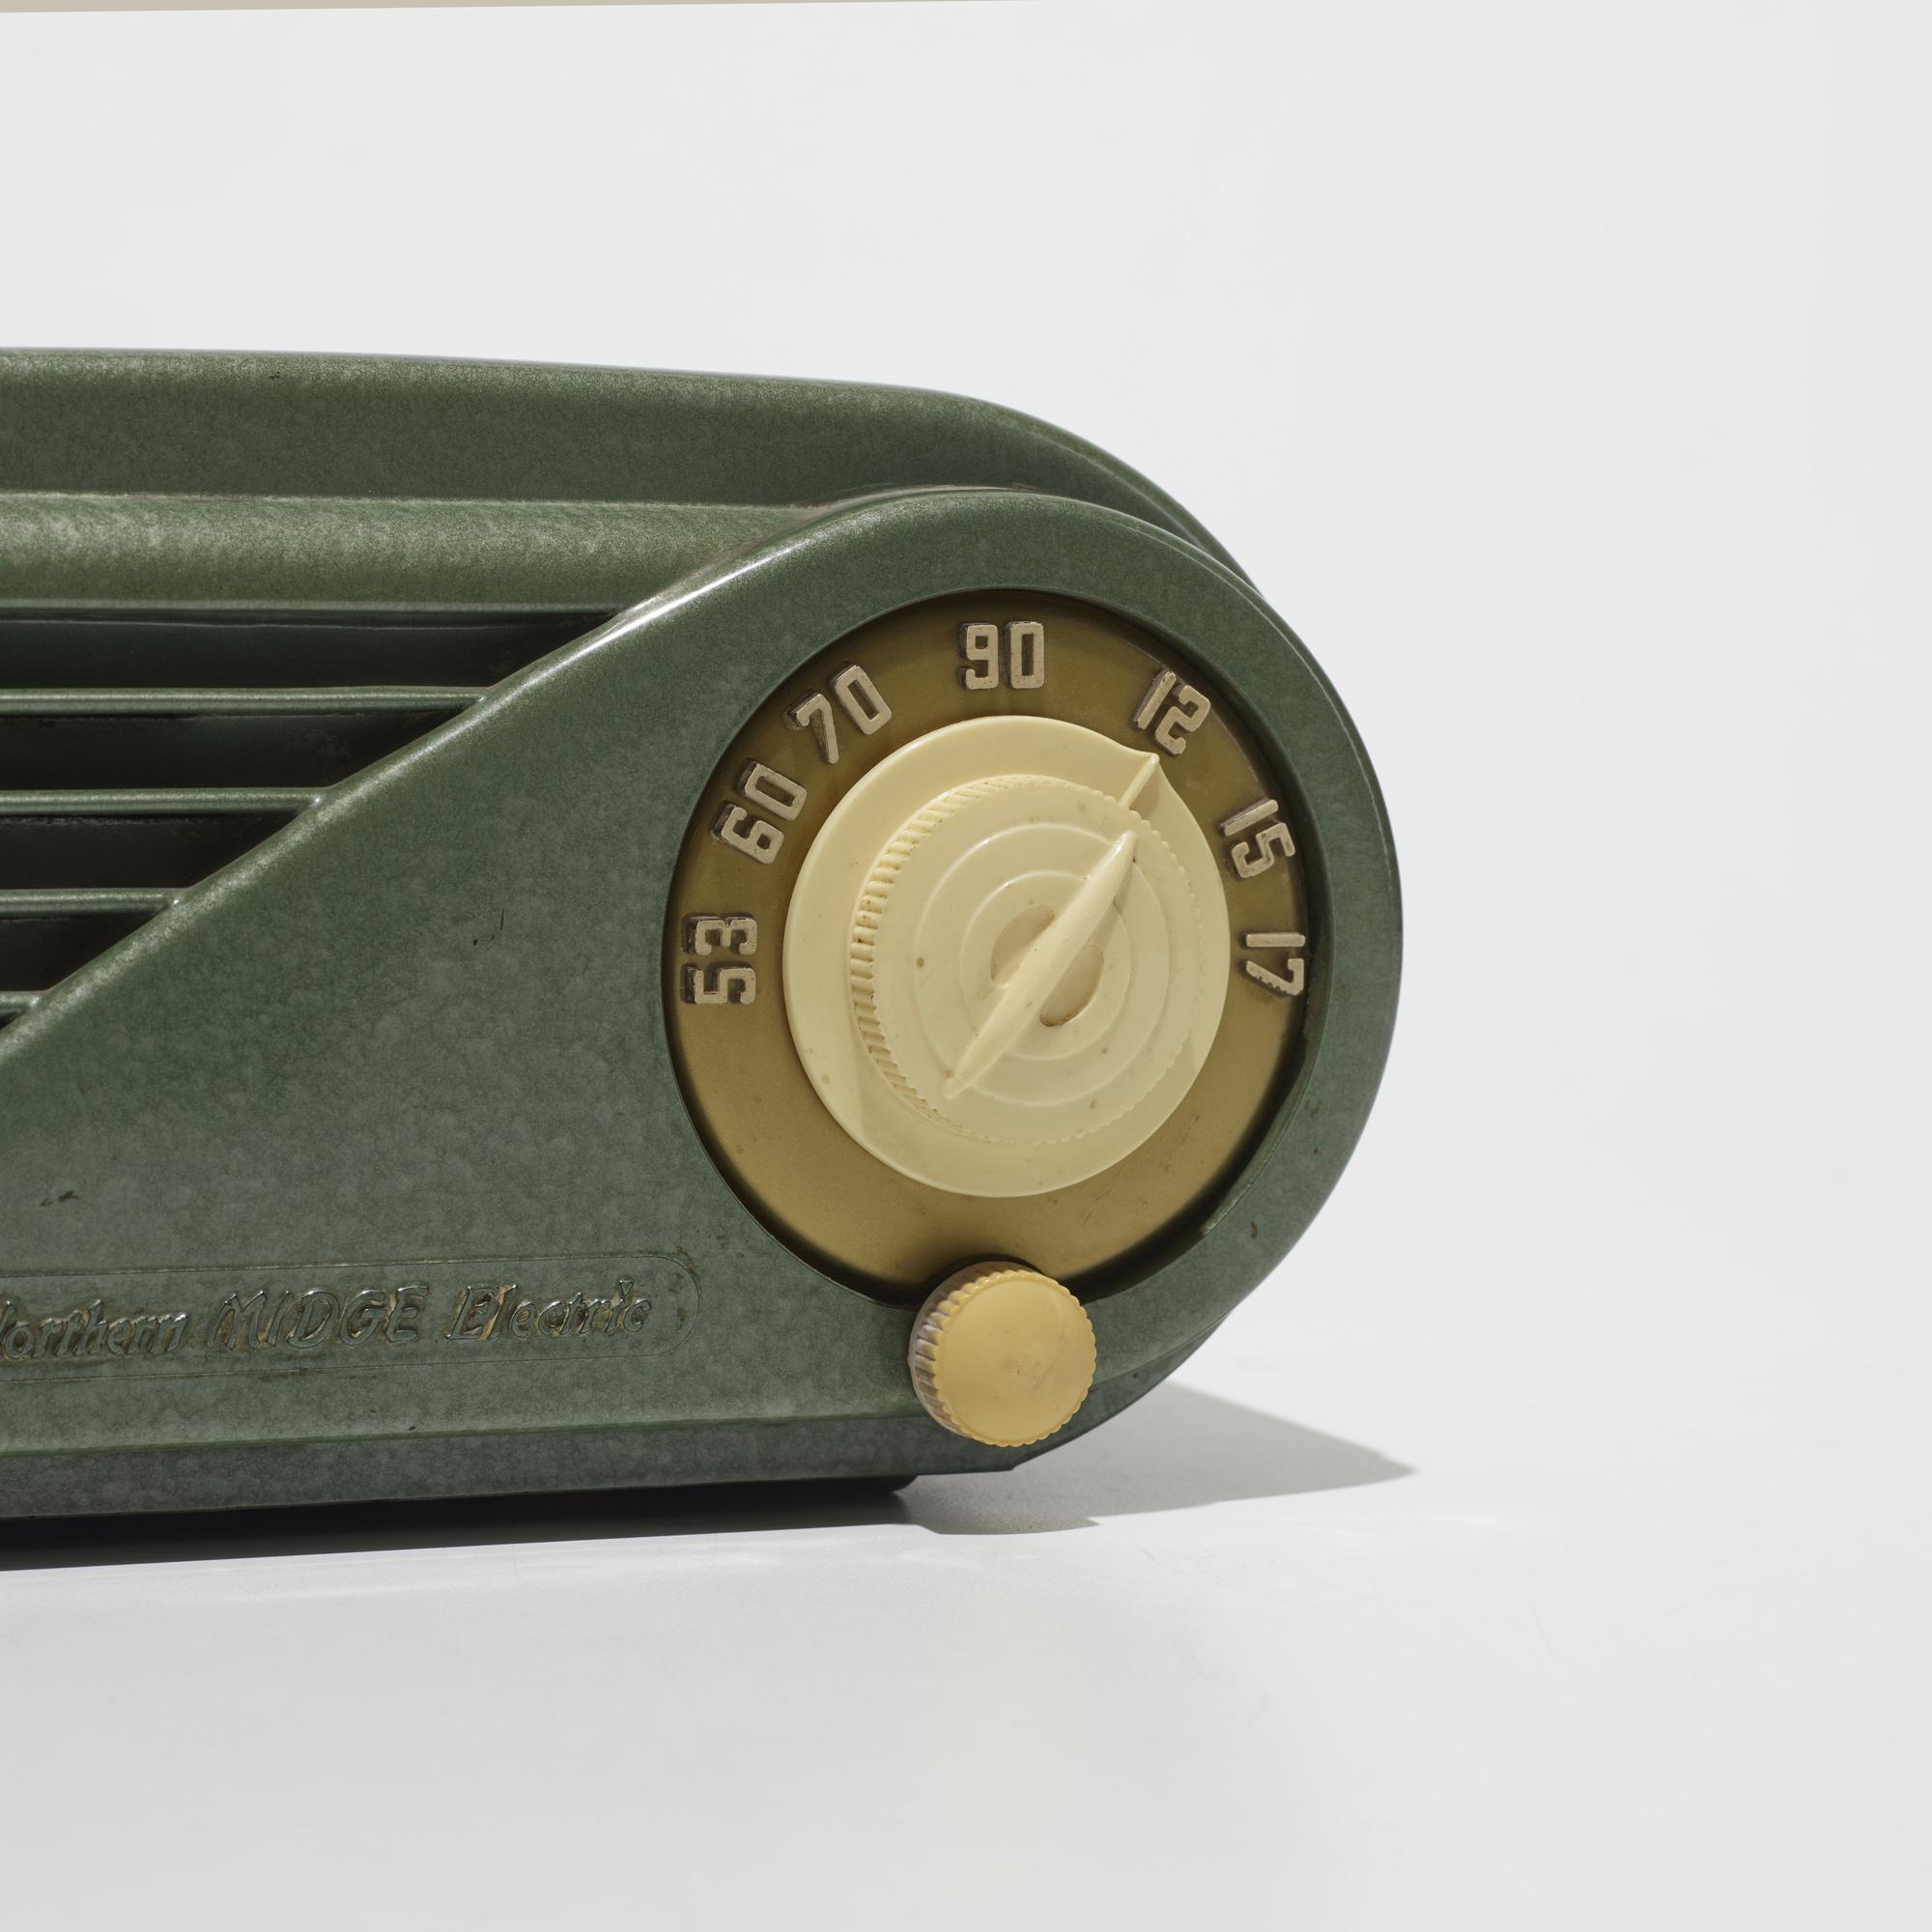 192: Northern Electric / Midge radio, model 5508 (3 of 3)